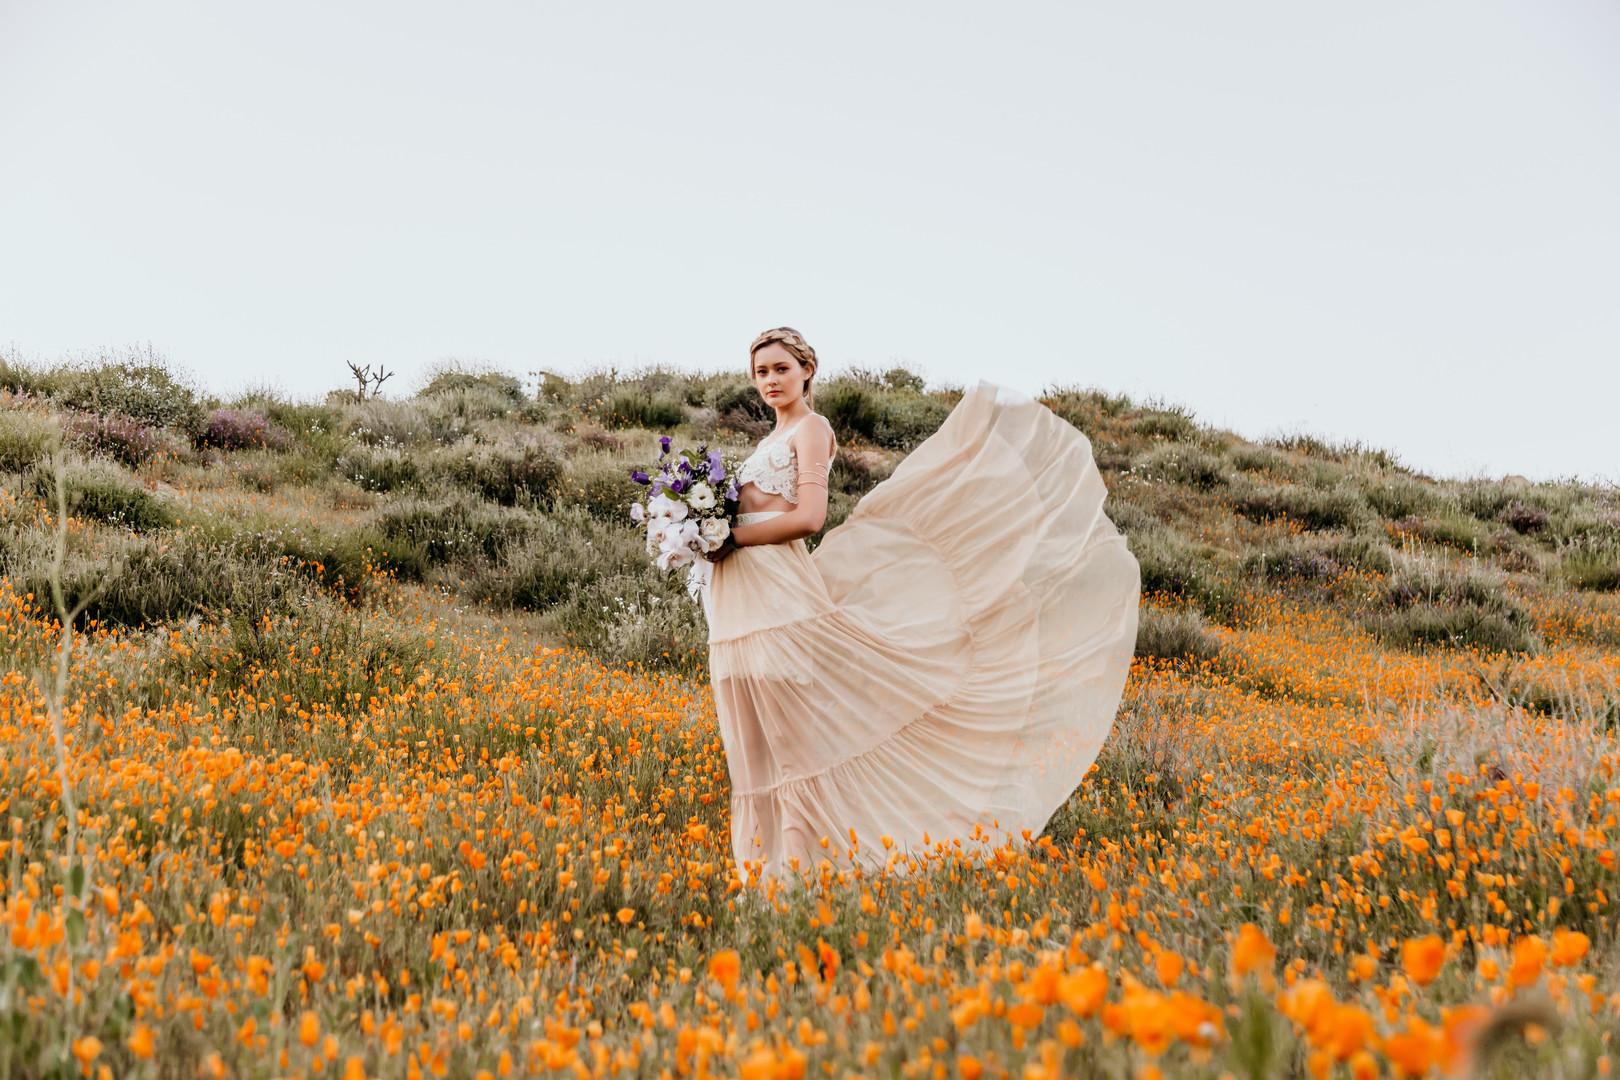 MelissaFeChapmanPhotography_PoppyfieldsbridalsessionwithBrookebyMelissaFeChapmanPhotography328191102_big.jpg